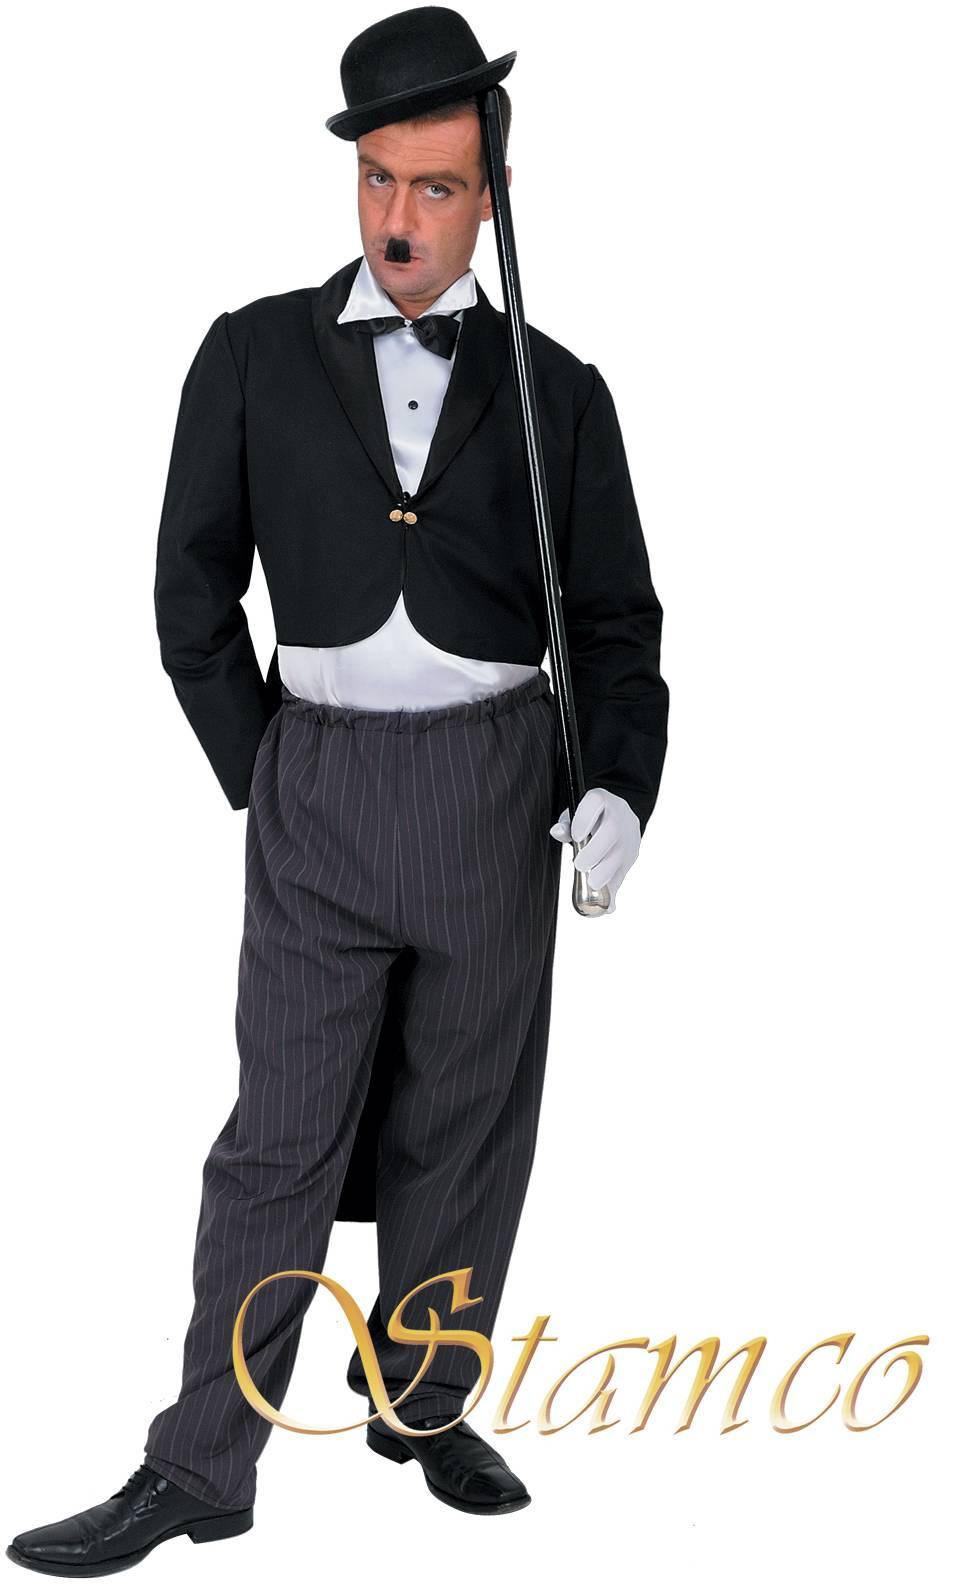 Costume-Charlot